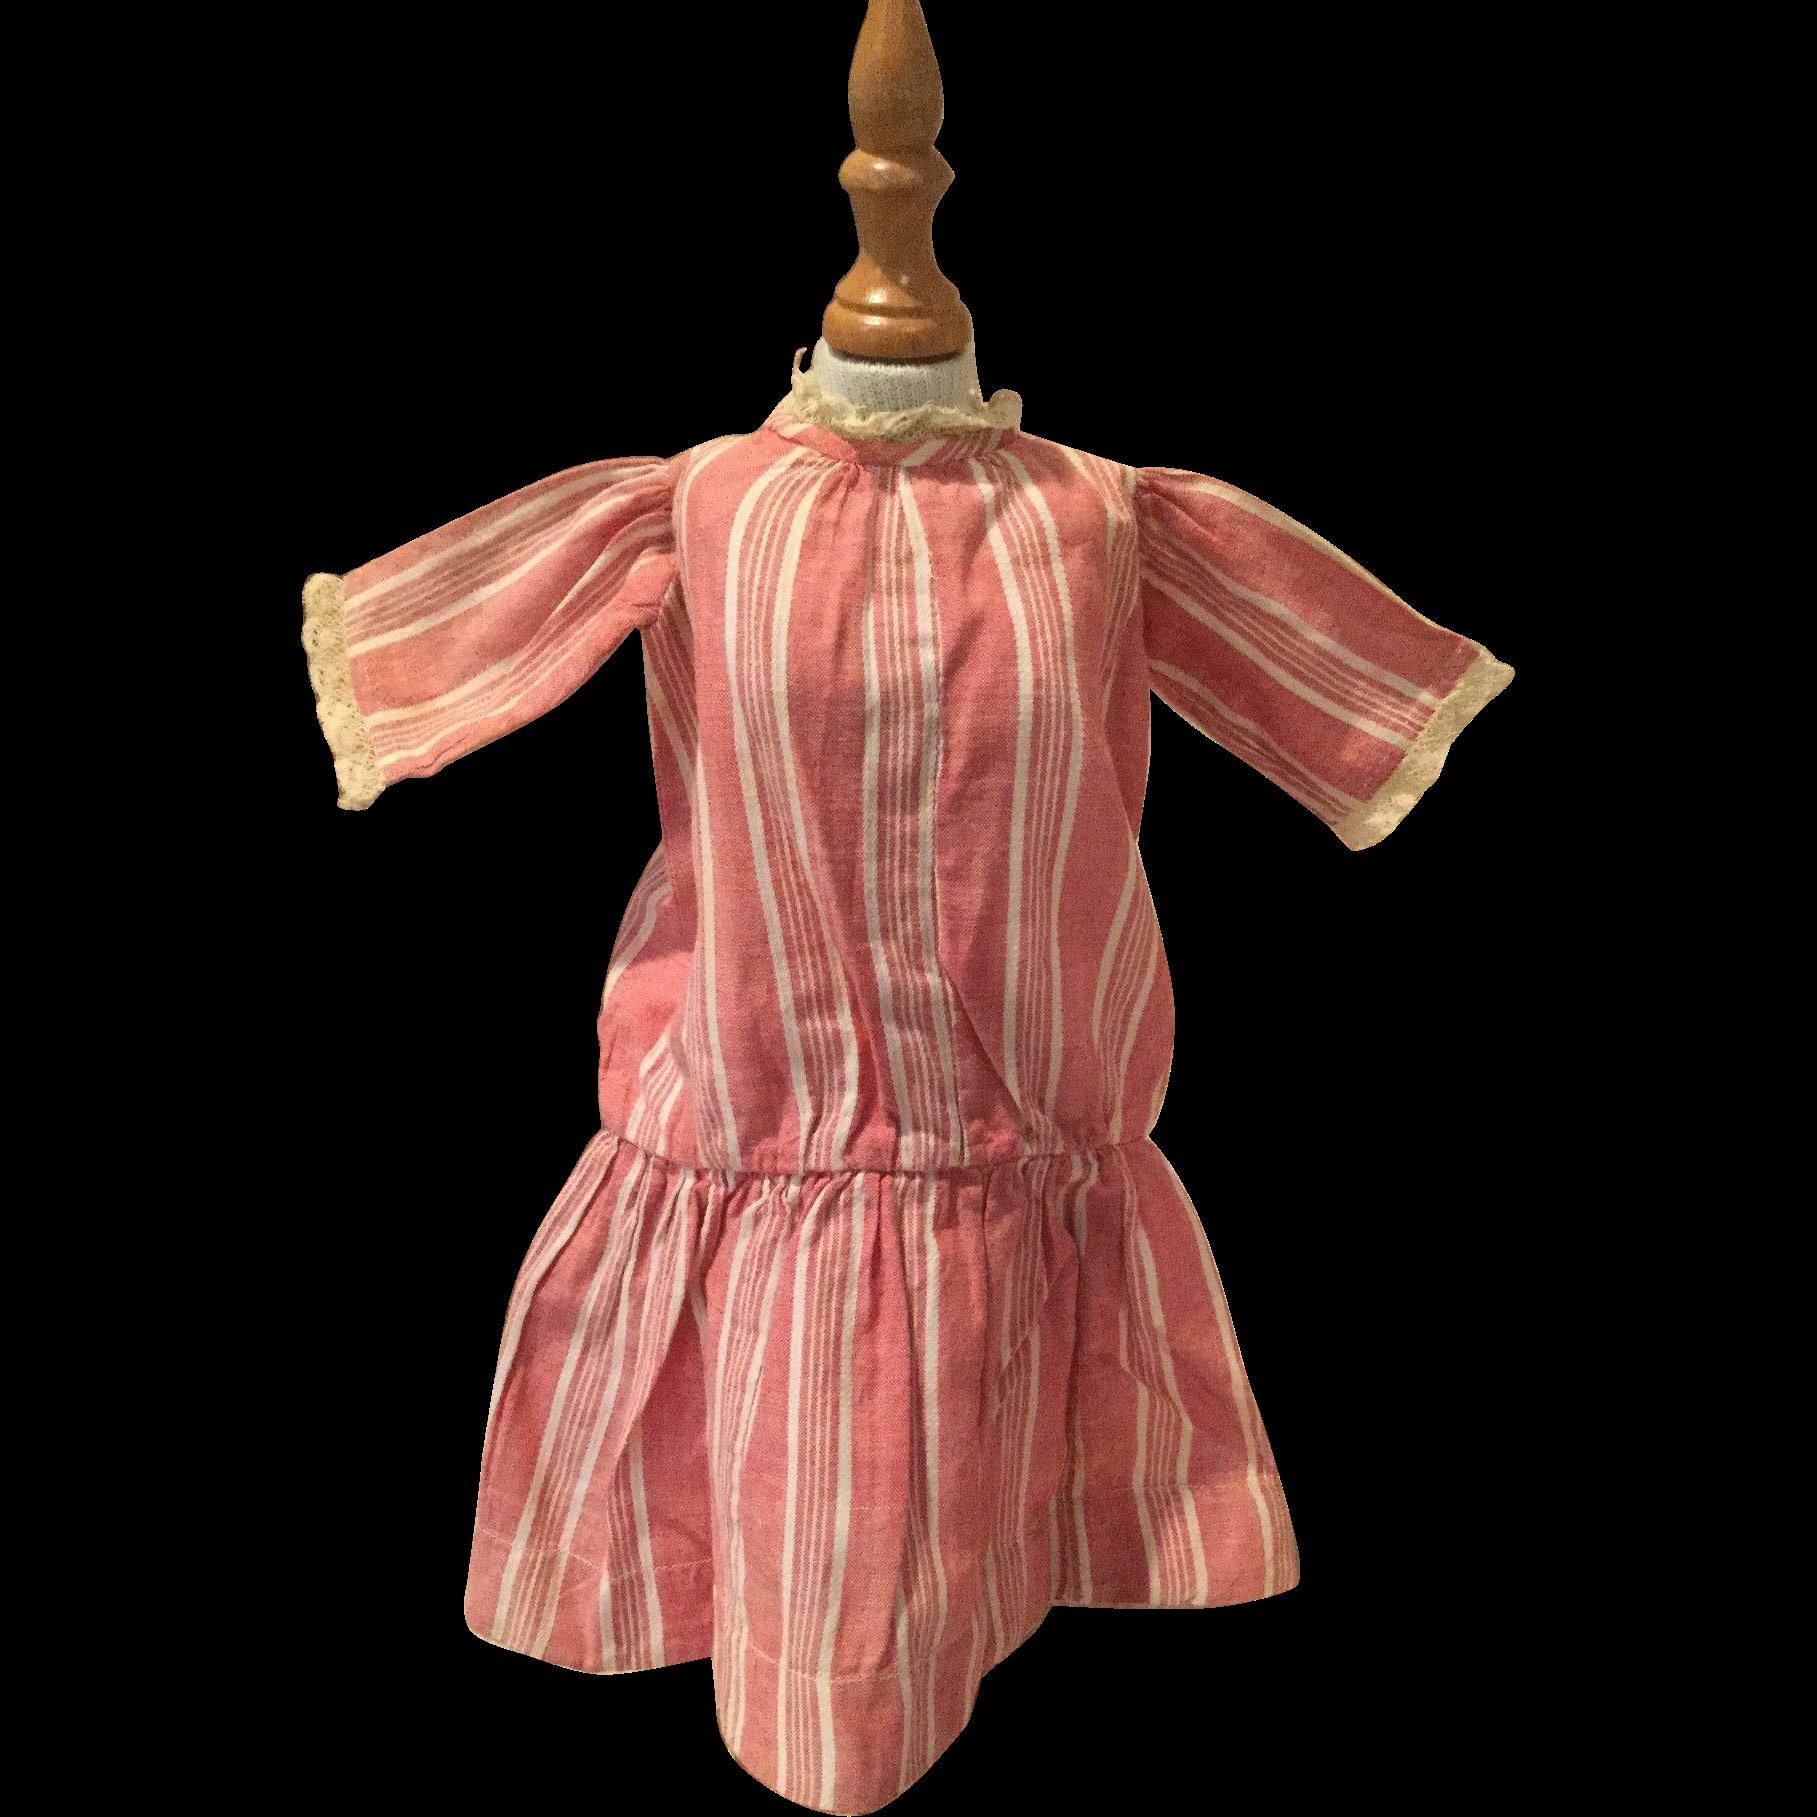 Early 20c. Red Striped Chambray School Girl Dress, Schoenhut Type